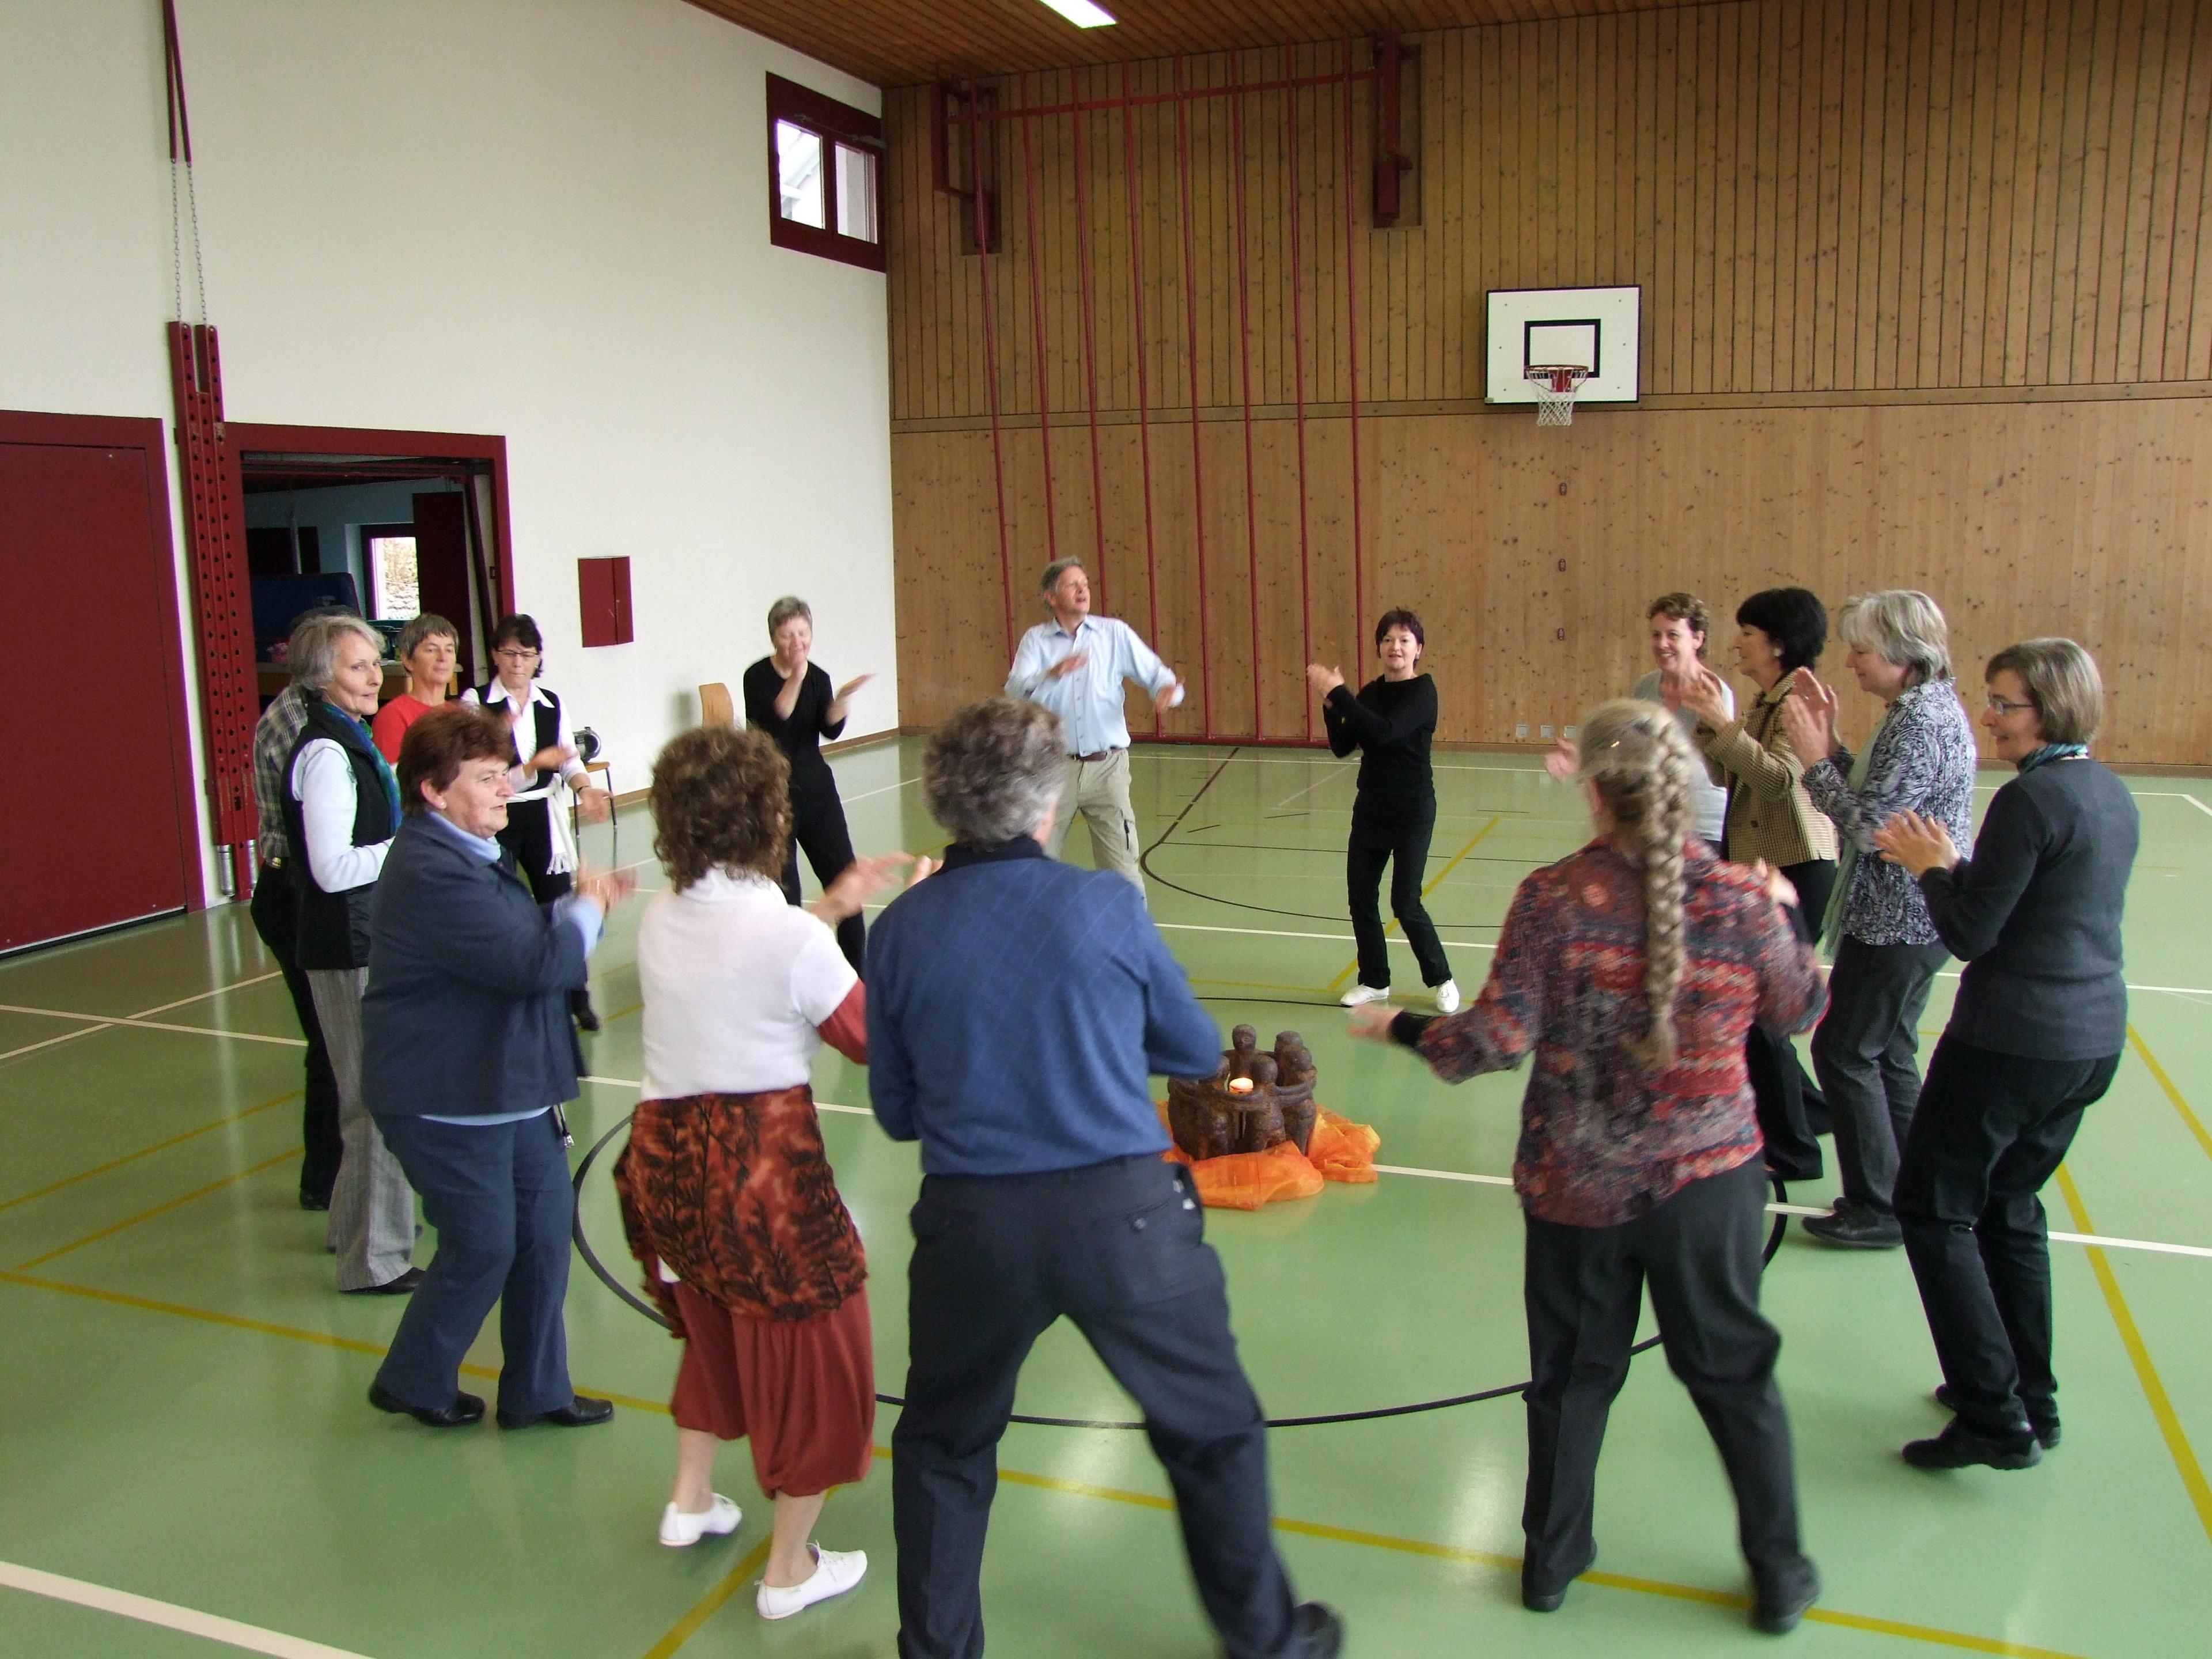 0331-2010-KirchengesangstagBuochs